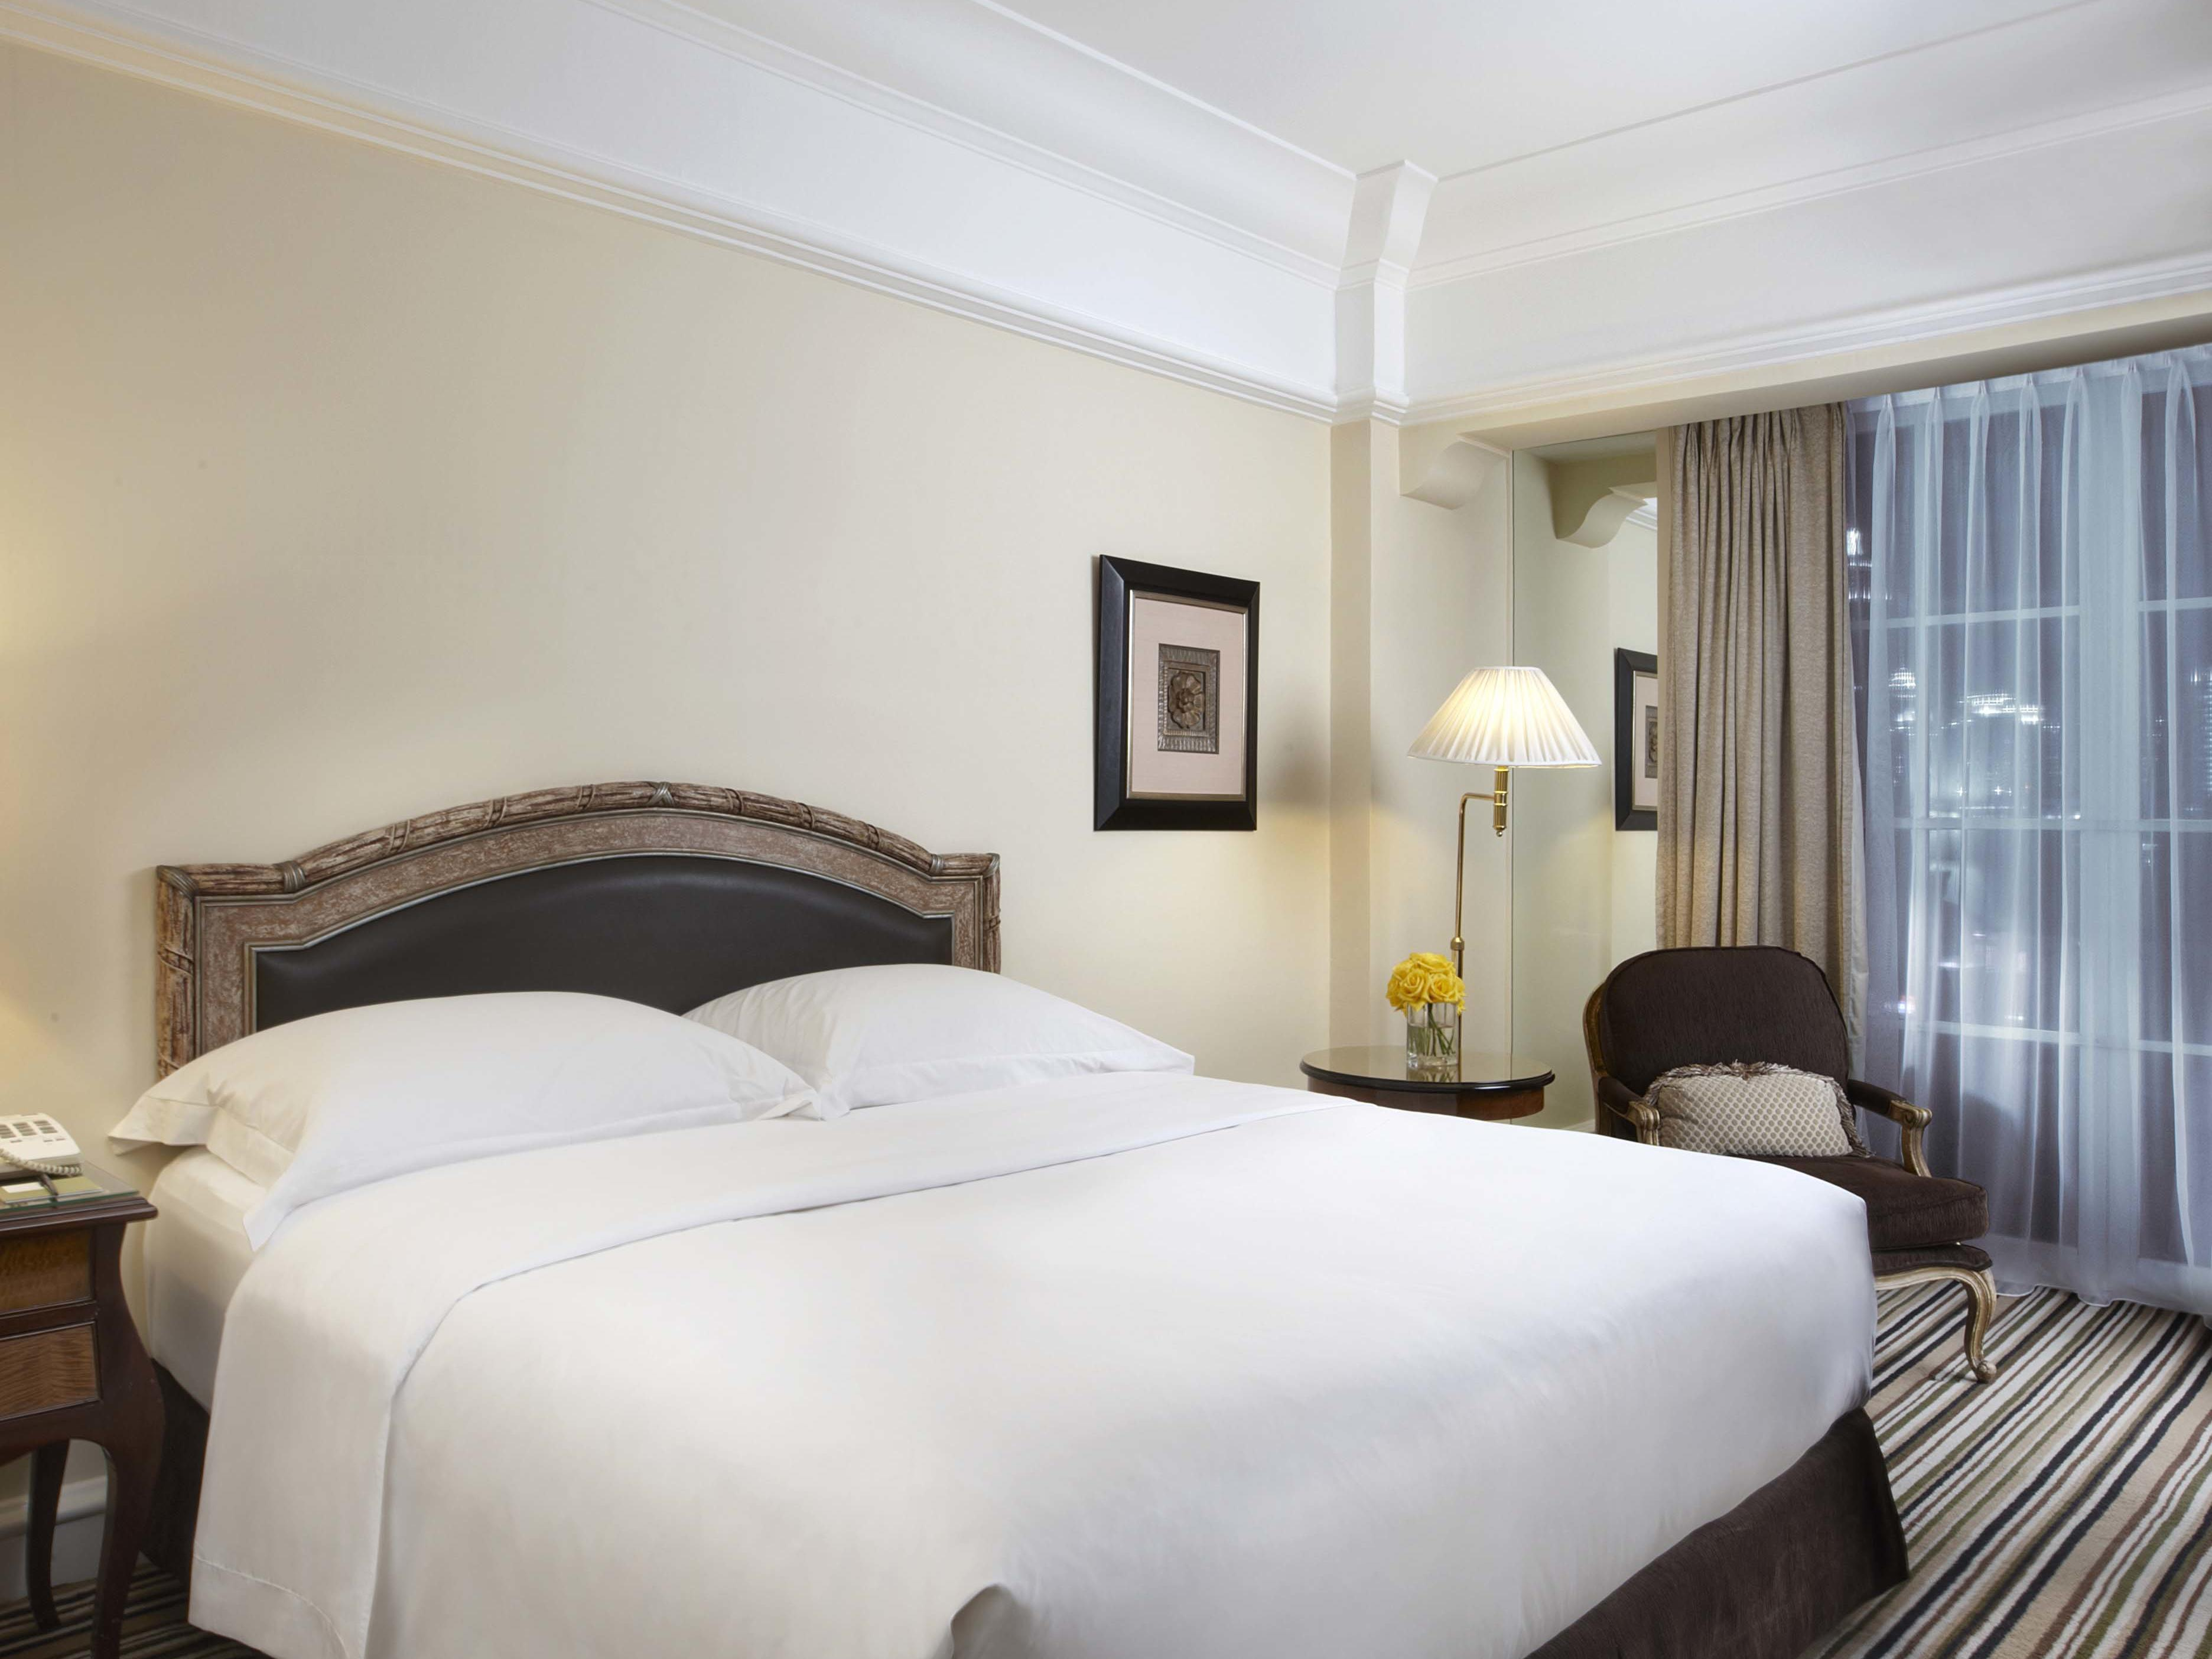 Deluxe Room at Hotel Gran Mahakam in Jakarta, Indonesia